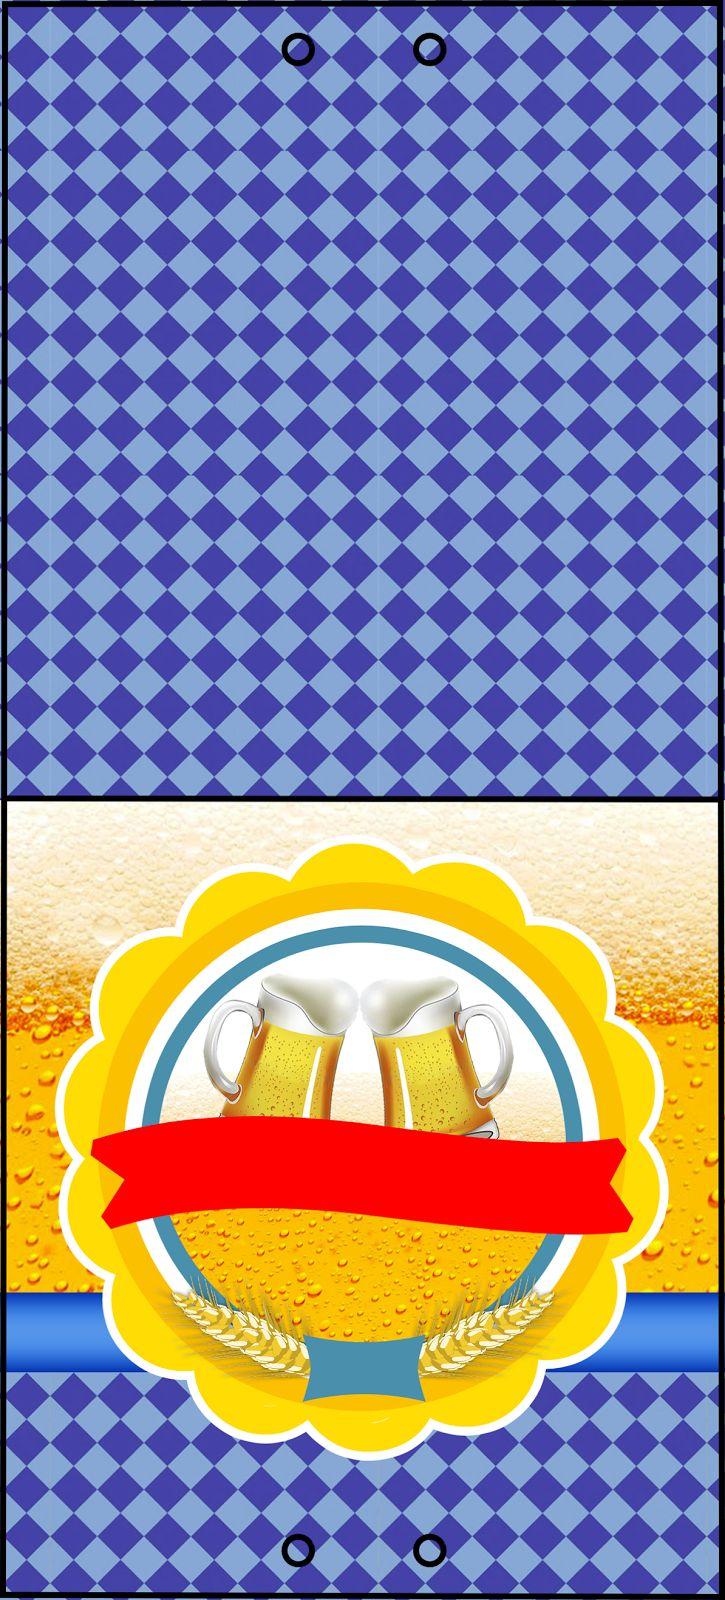 Cerveza 2 Otro Diseño Festa Boteco